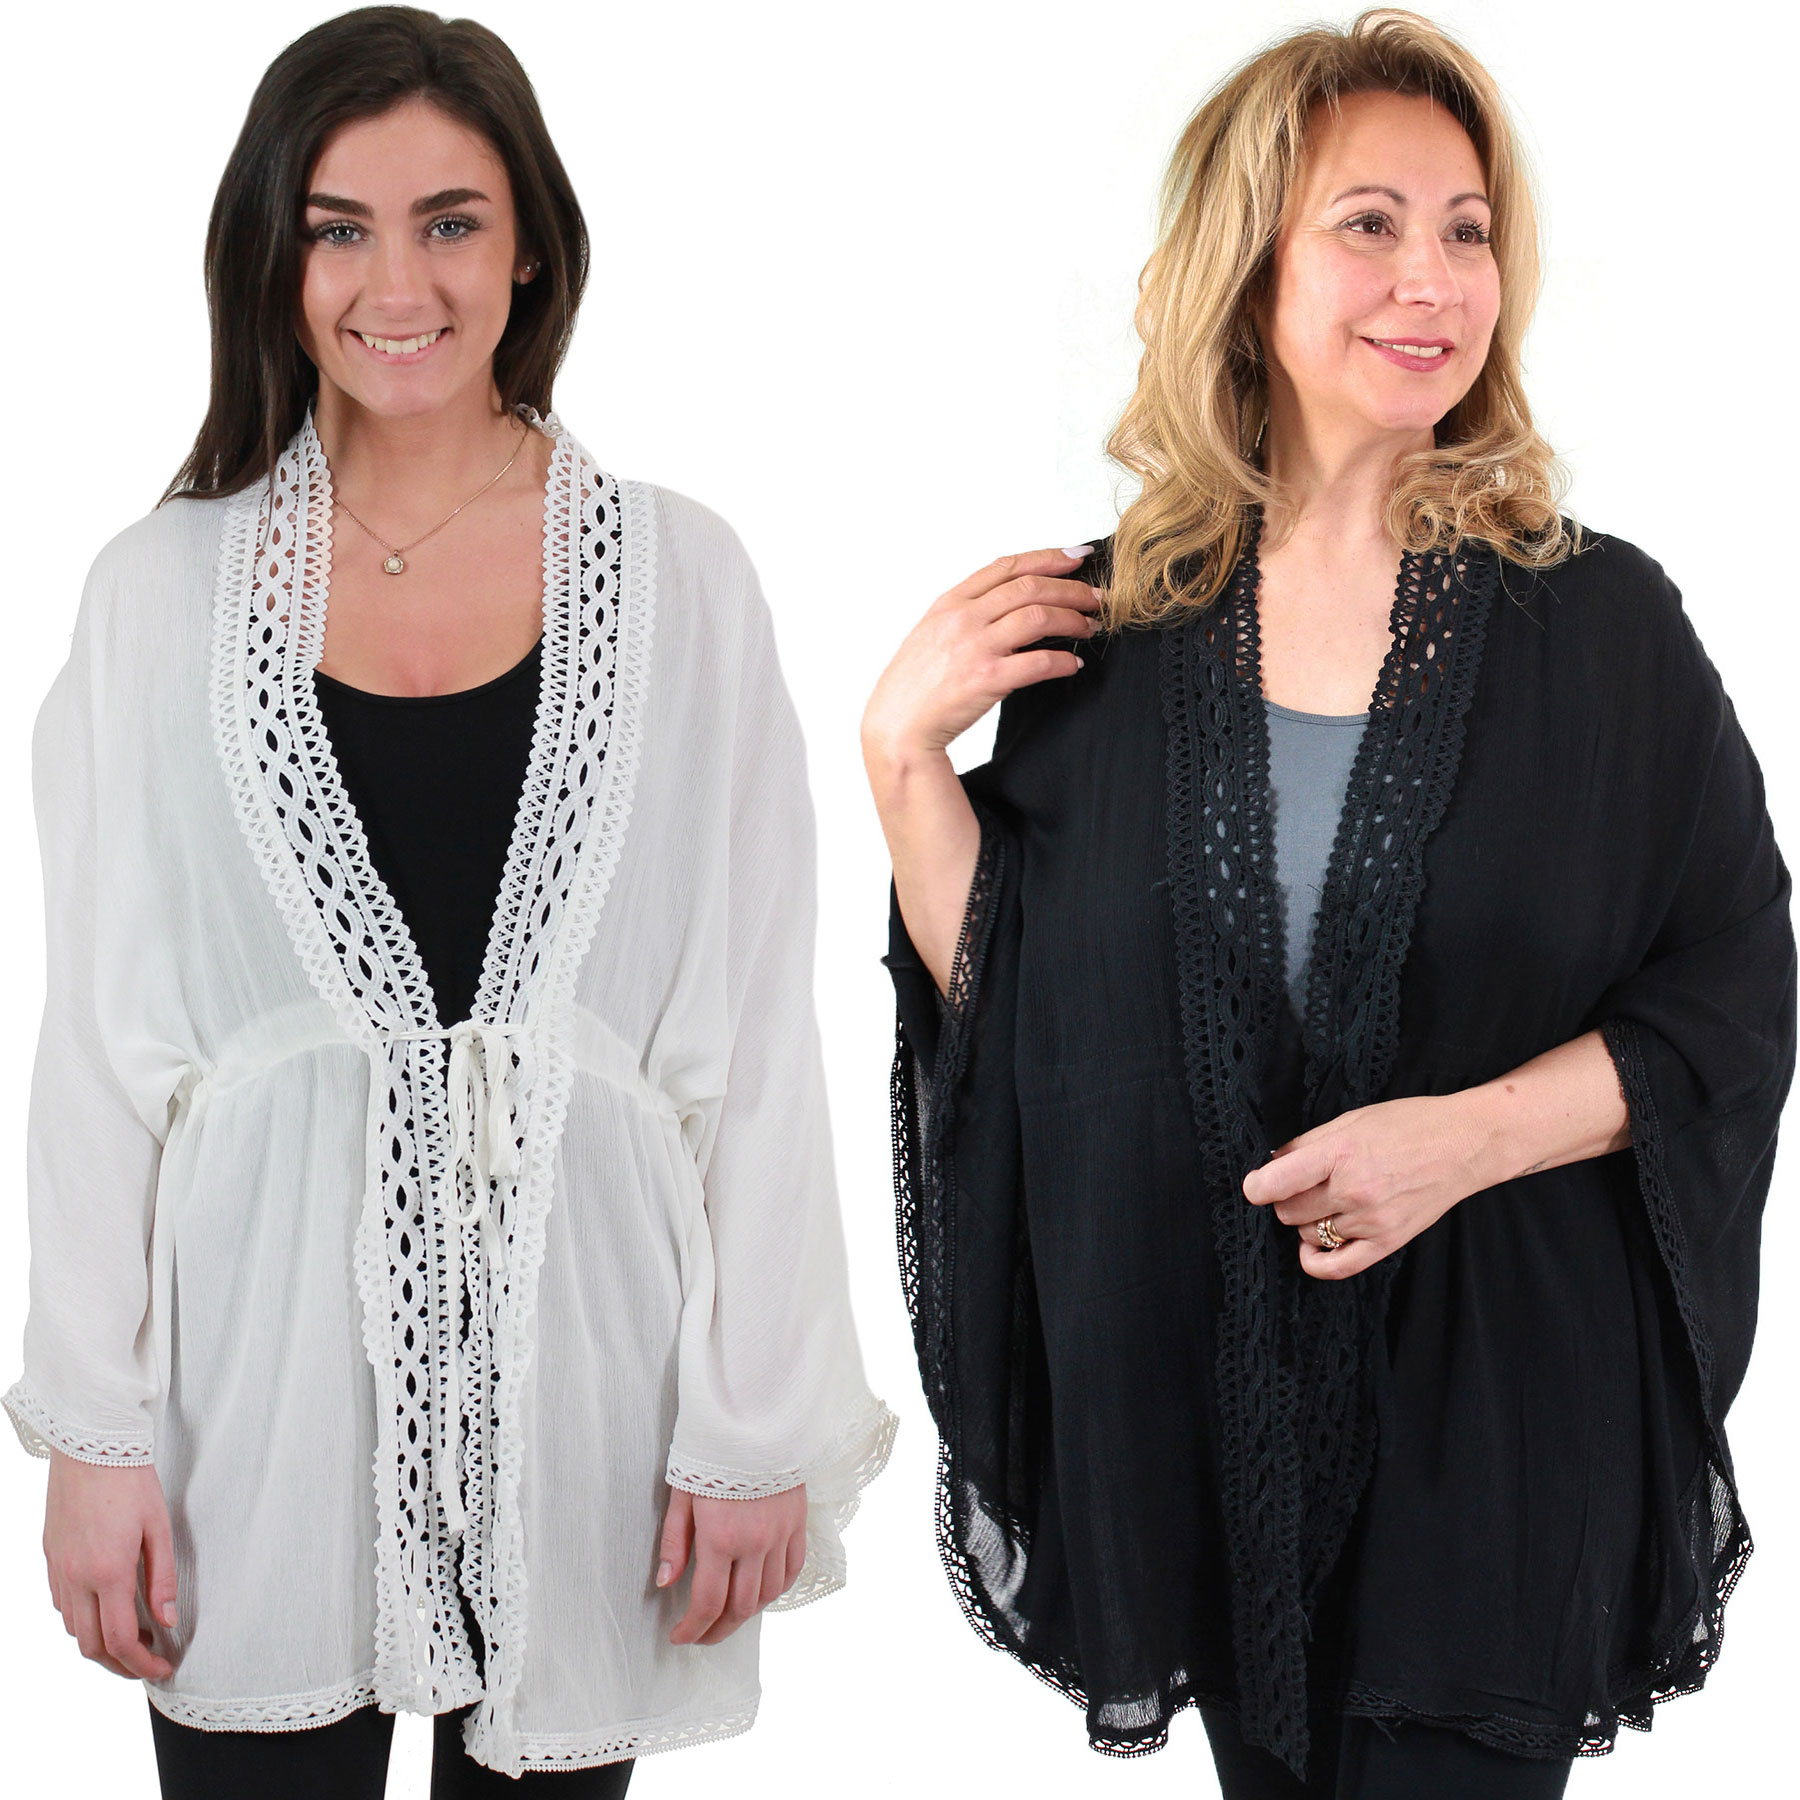 Kimono - Solid with Crochet Border 9621